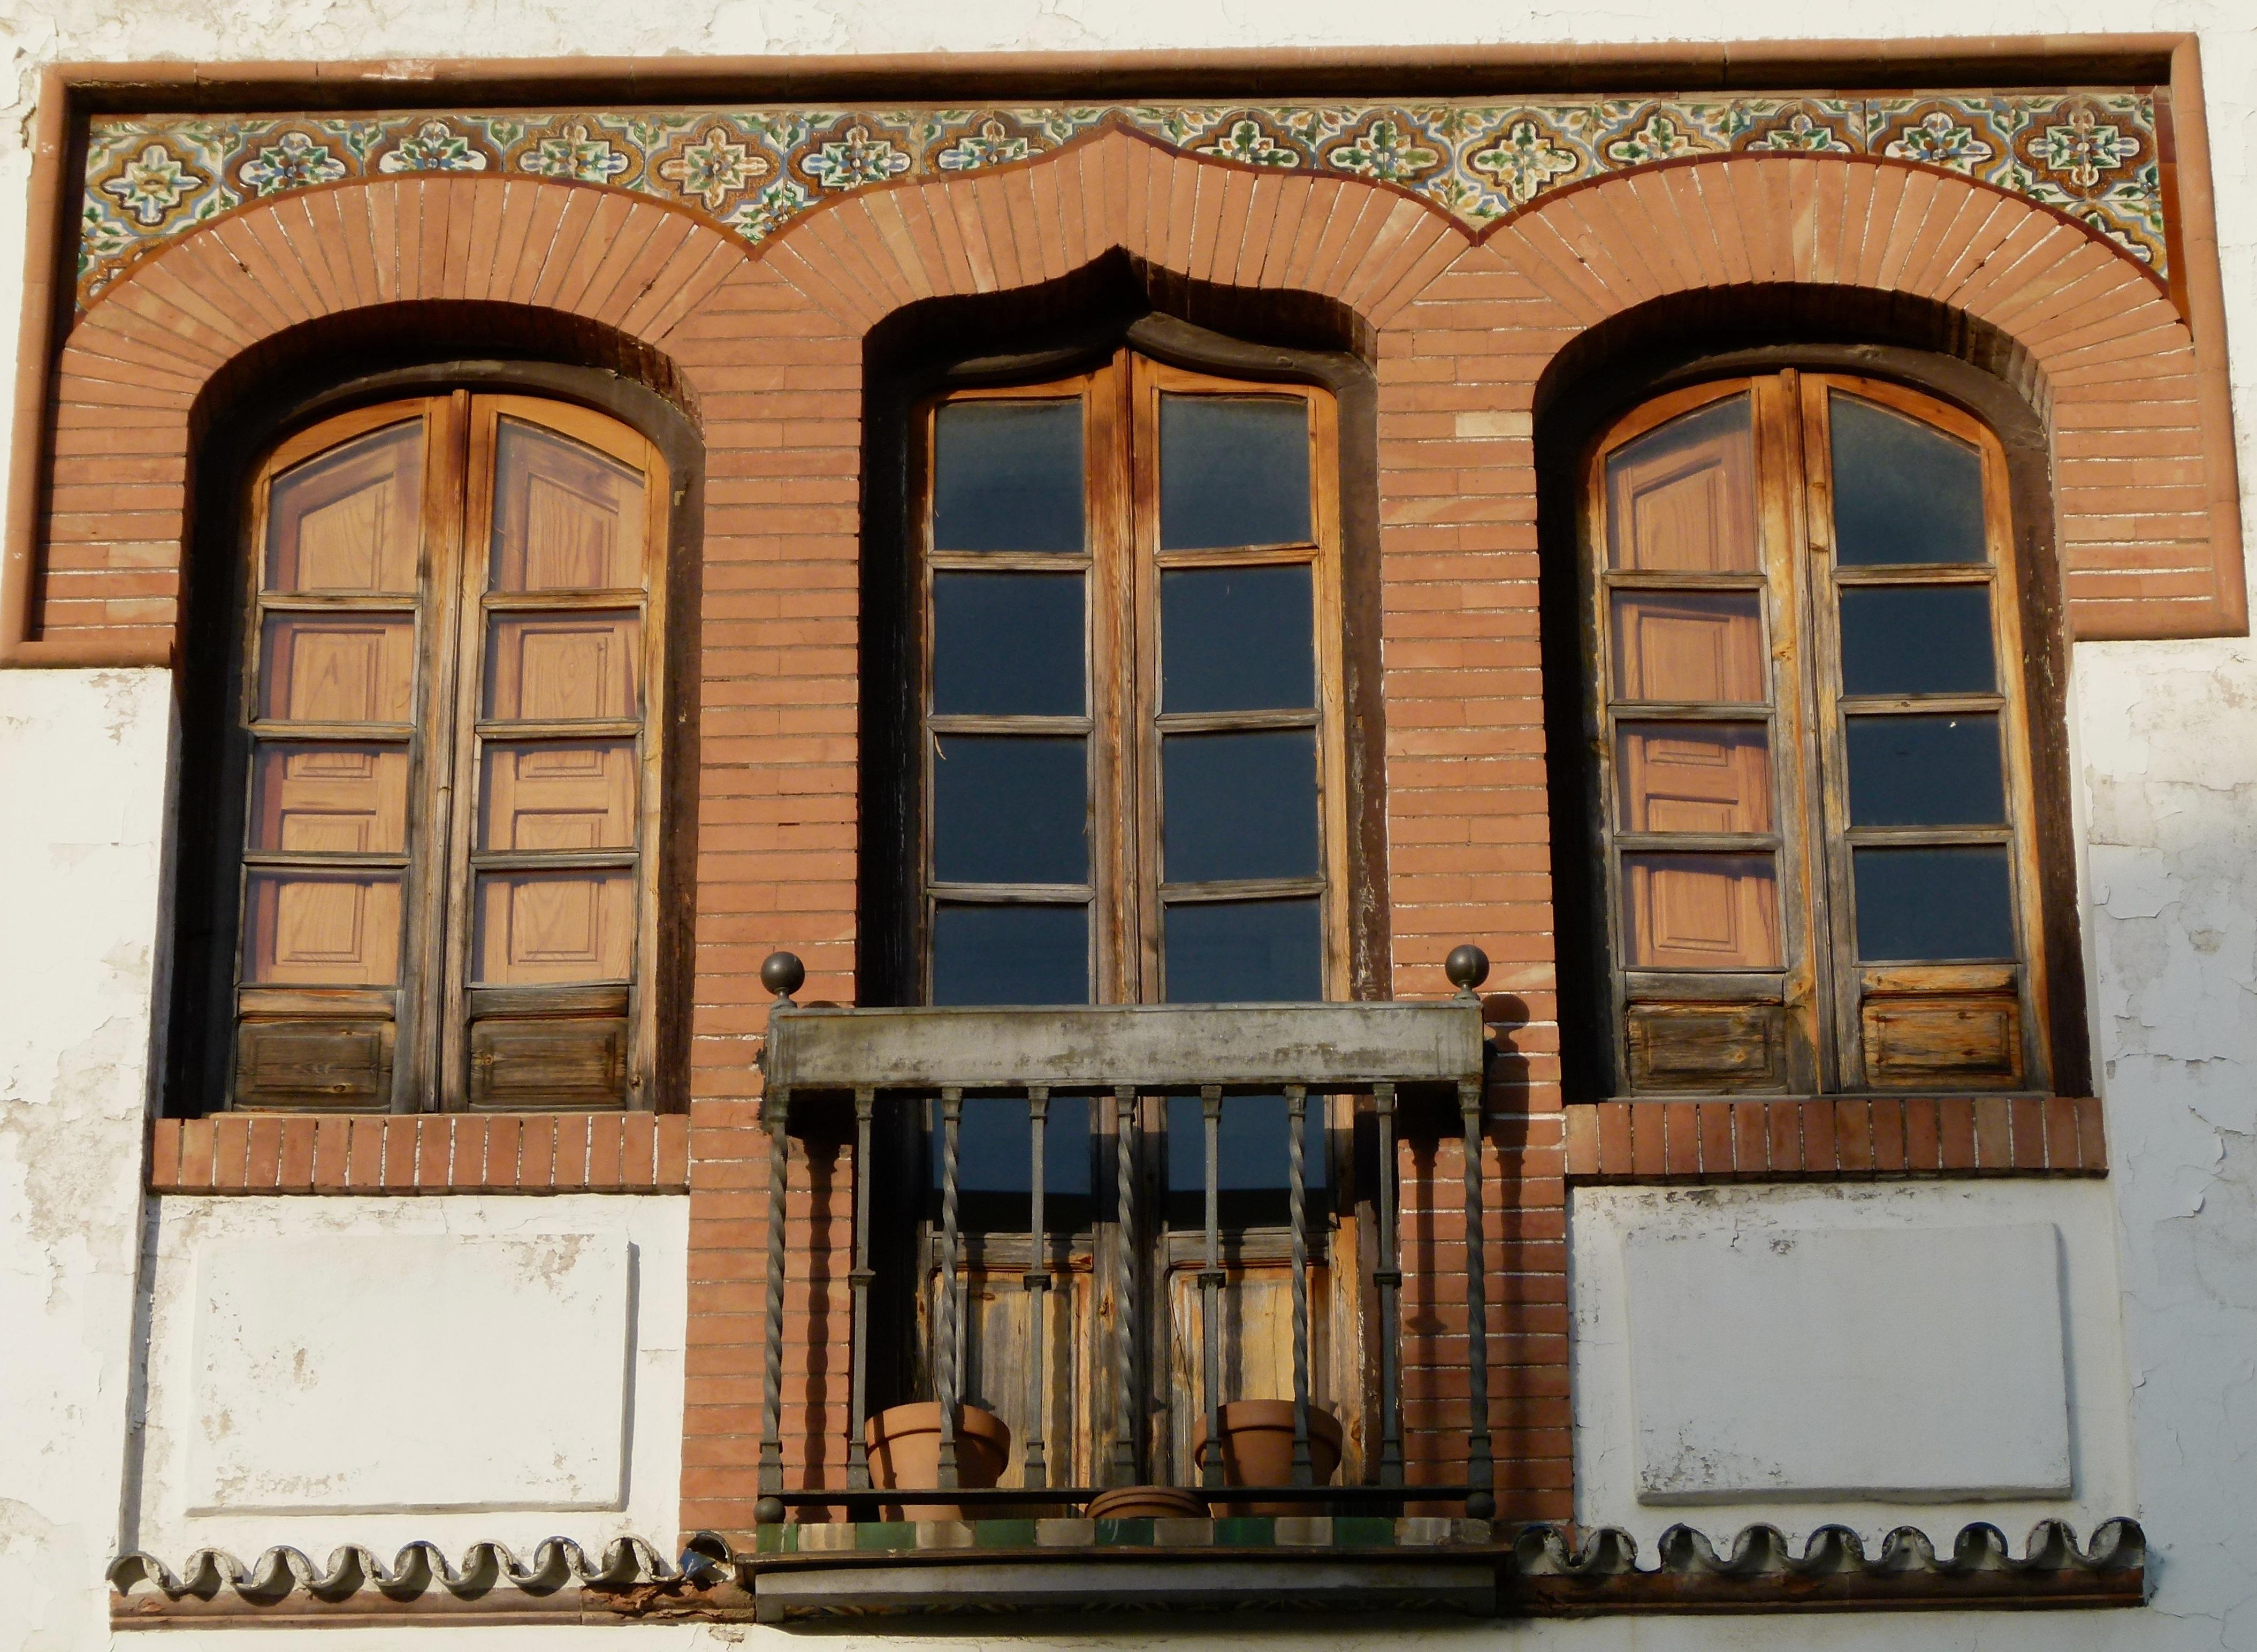 Fotos gratis arquitectura madera palacio casa ventana